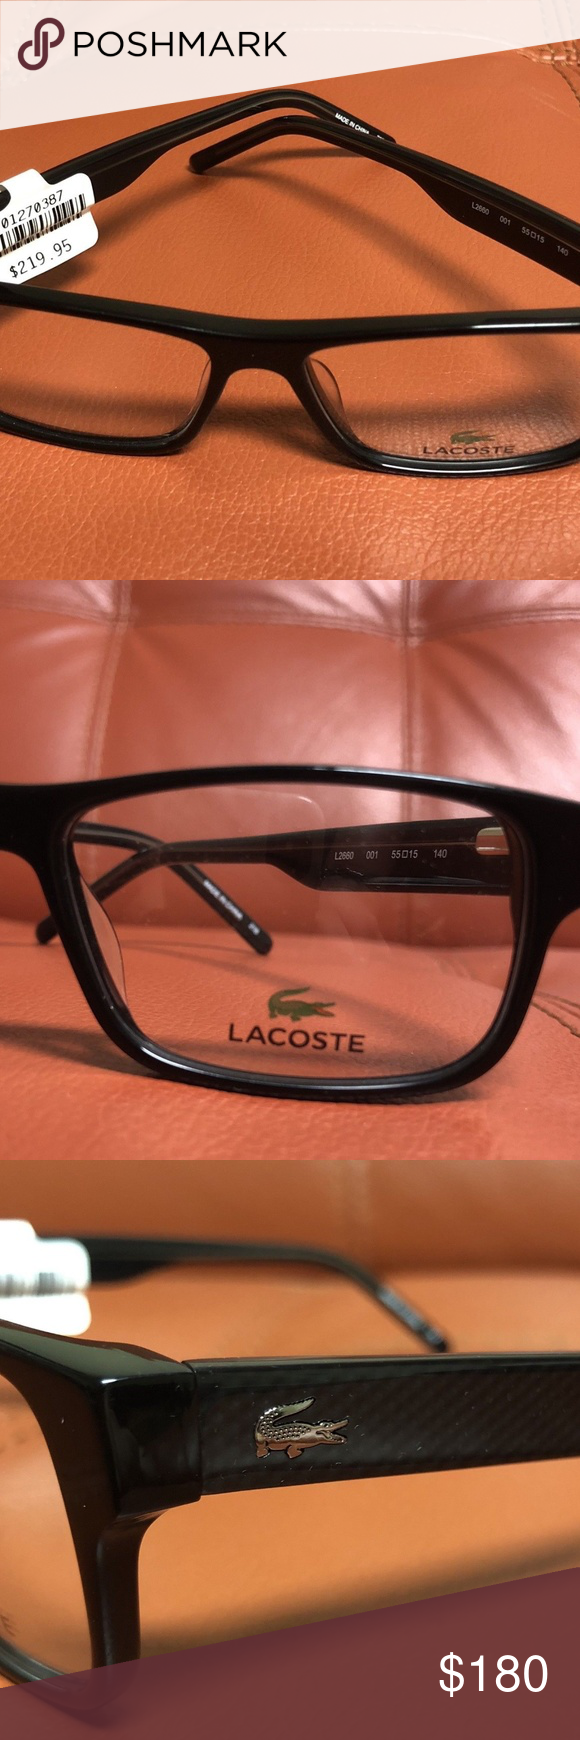 4dda3e5cee9 Lacoste Mens Eyeglasses L2660 Black Full Rim 55MM GLASSES ARE NEW - WITH  PRICE TAGS STILL